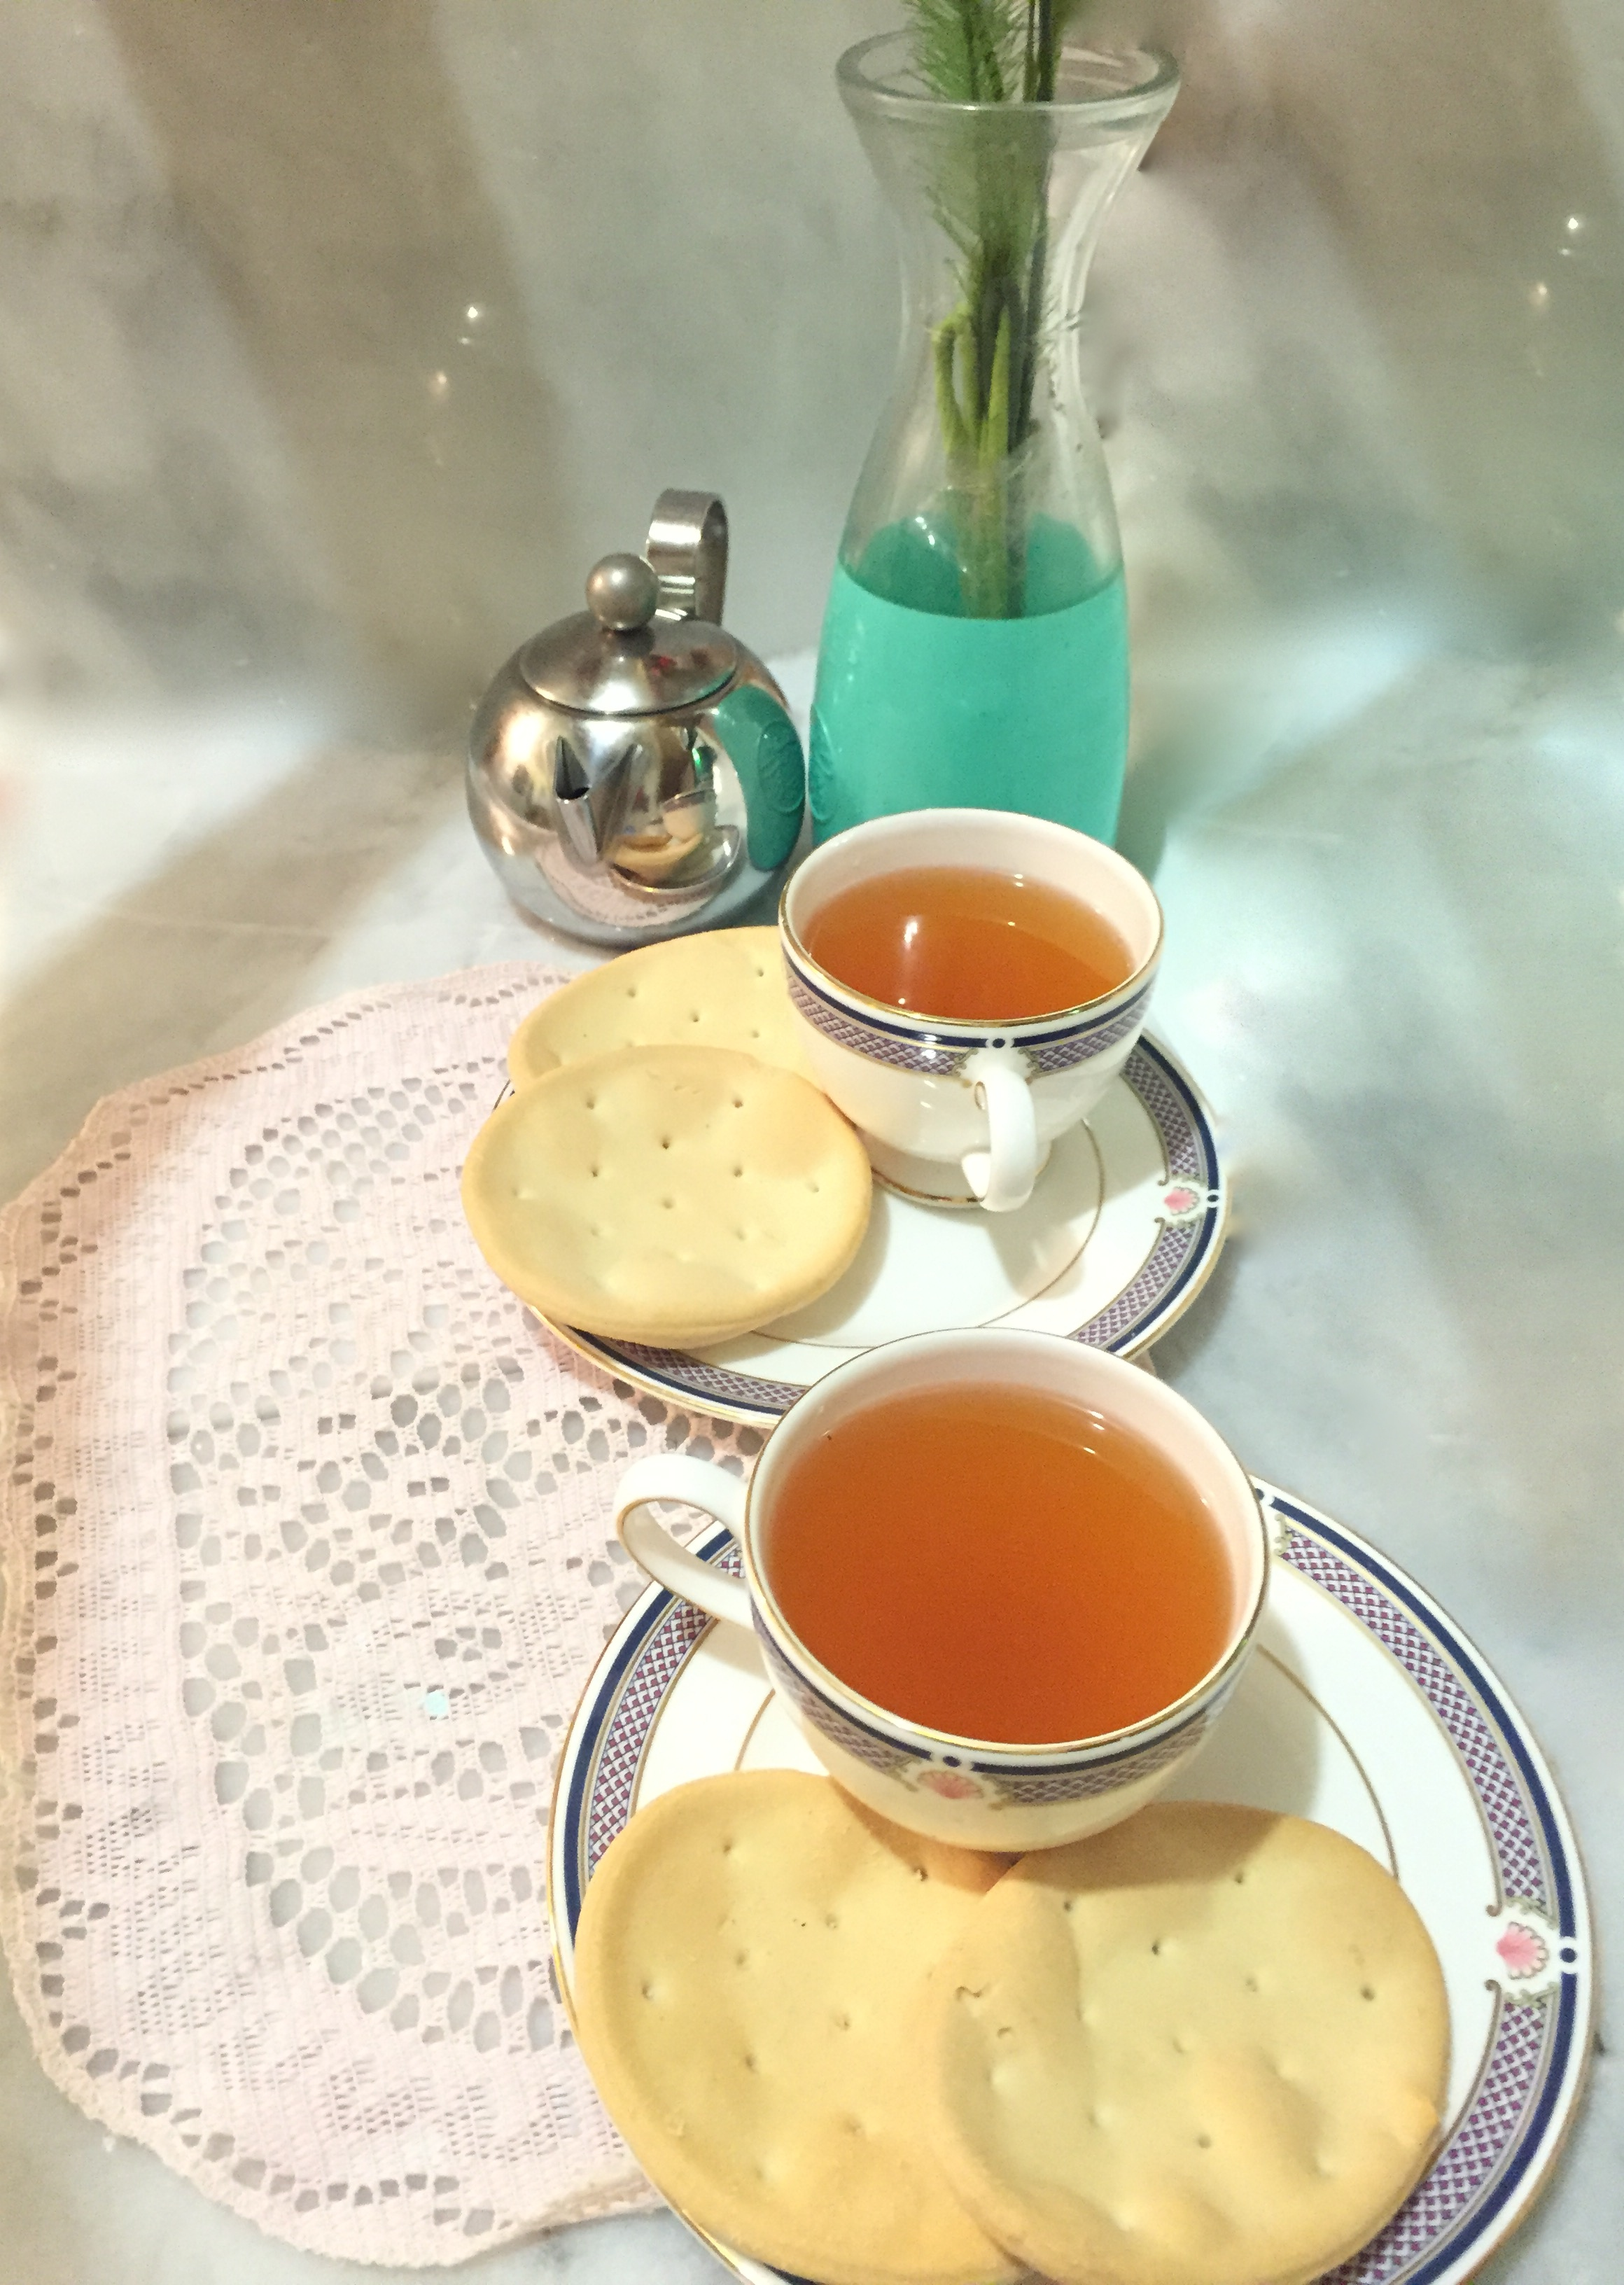 Comfort tea served with biscuits or cookies